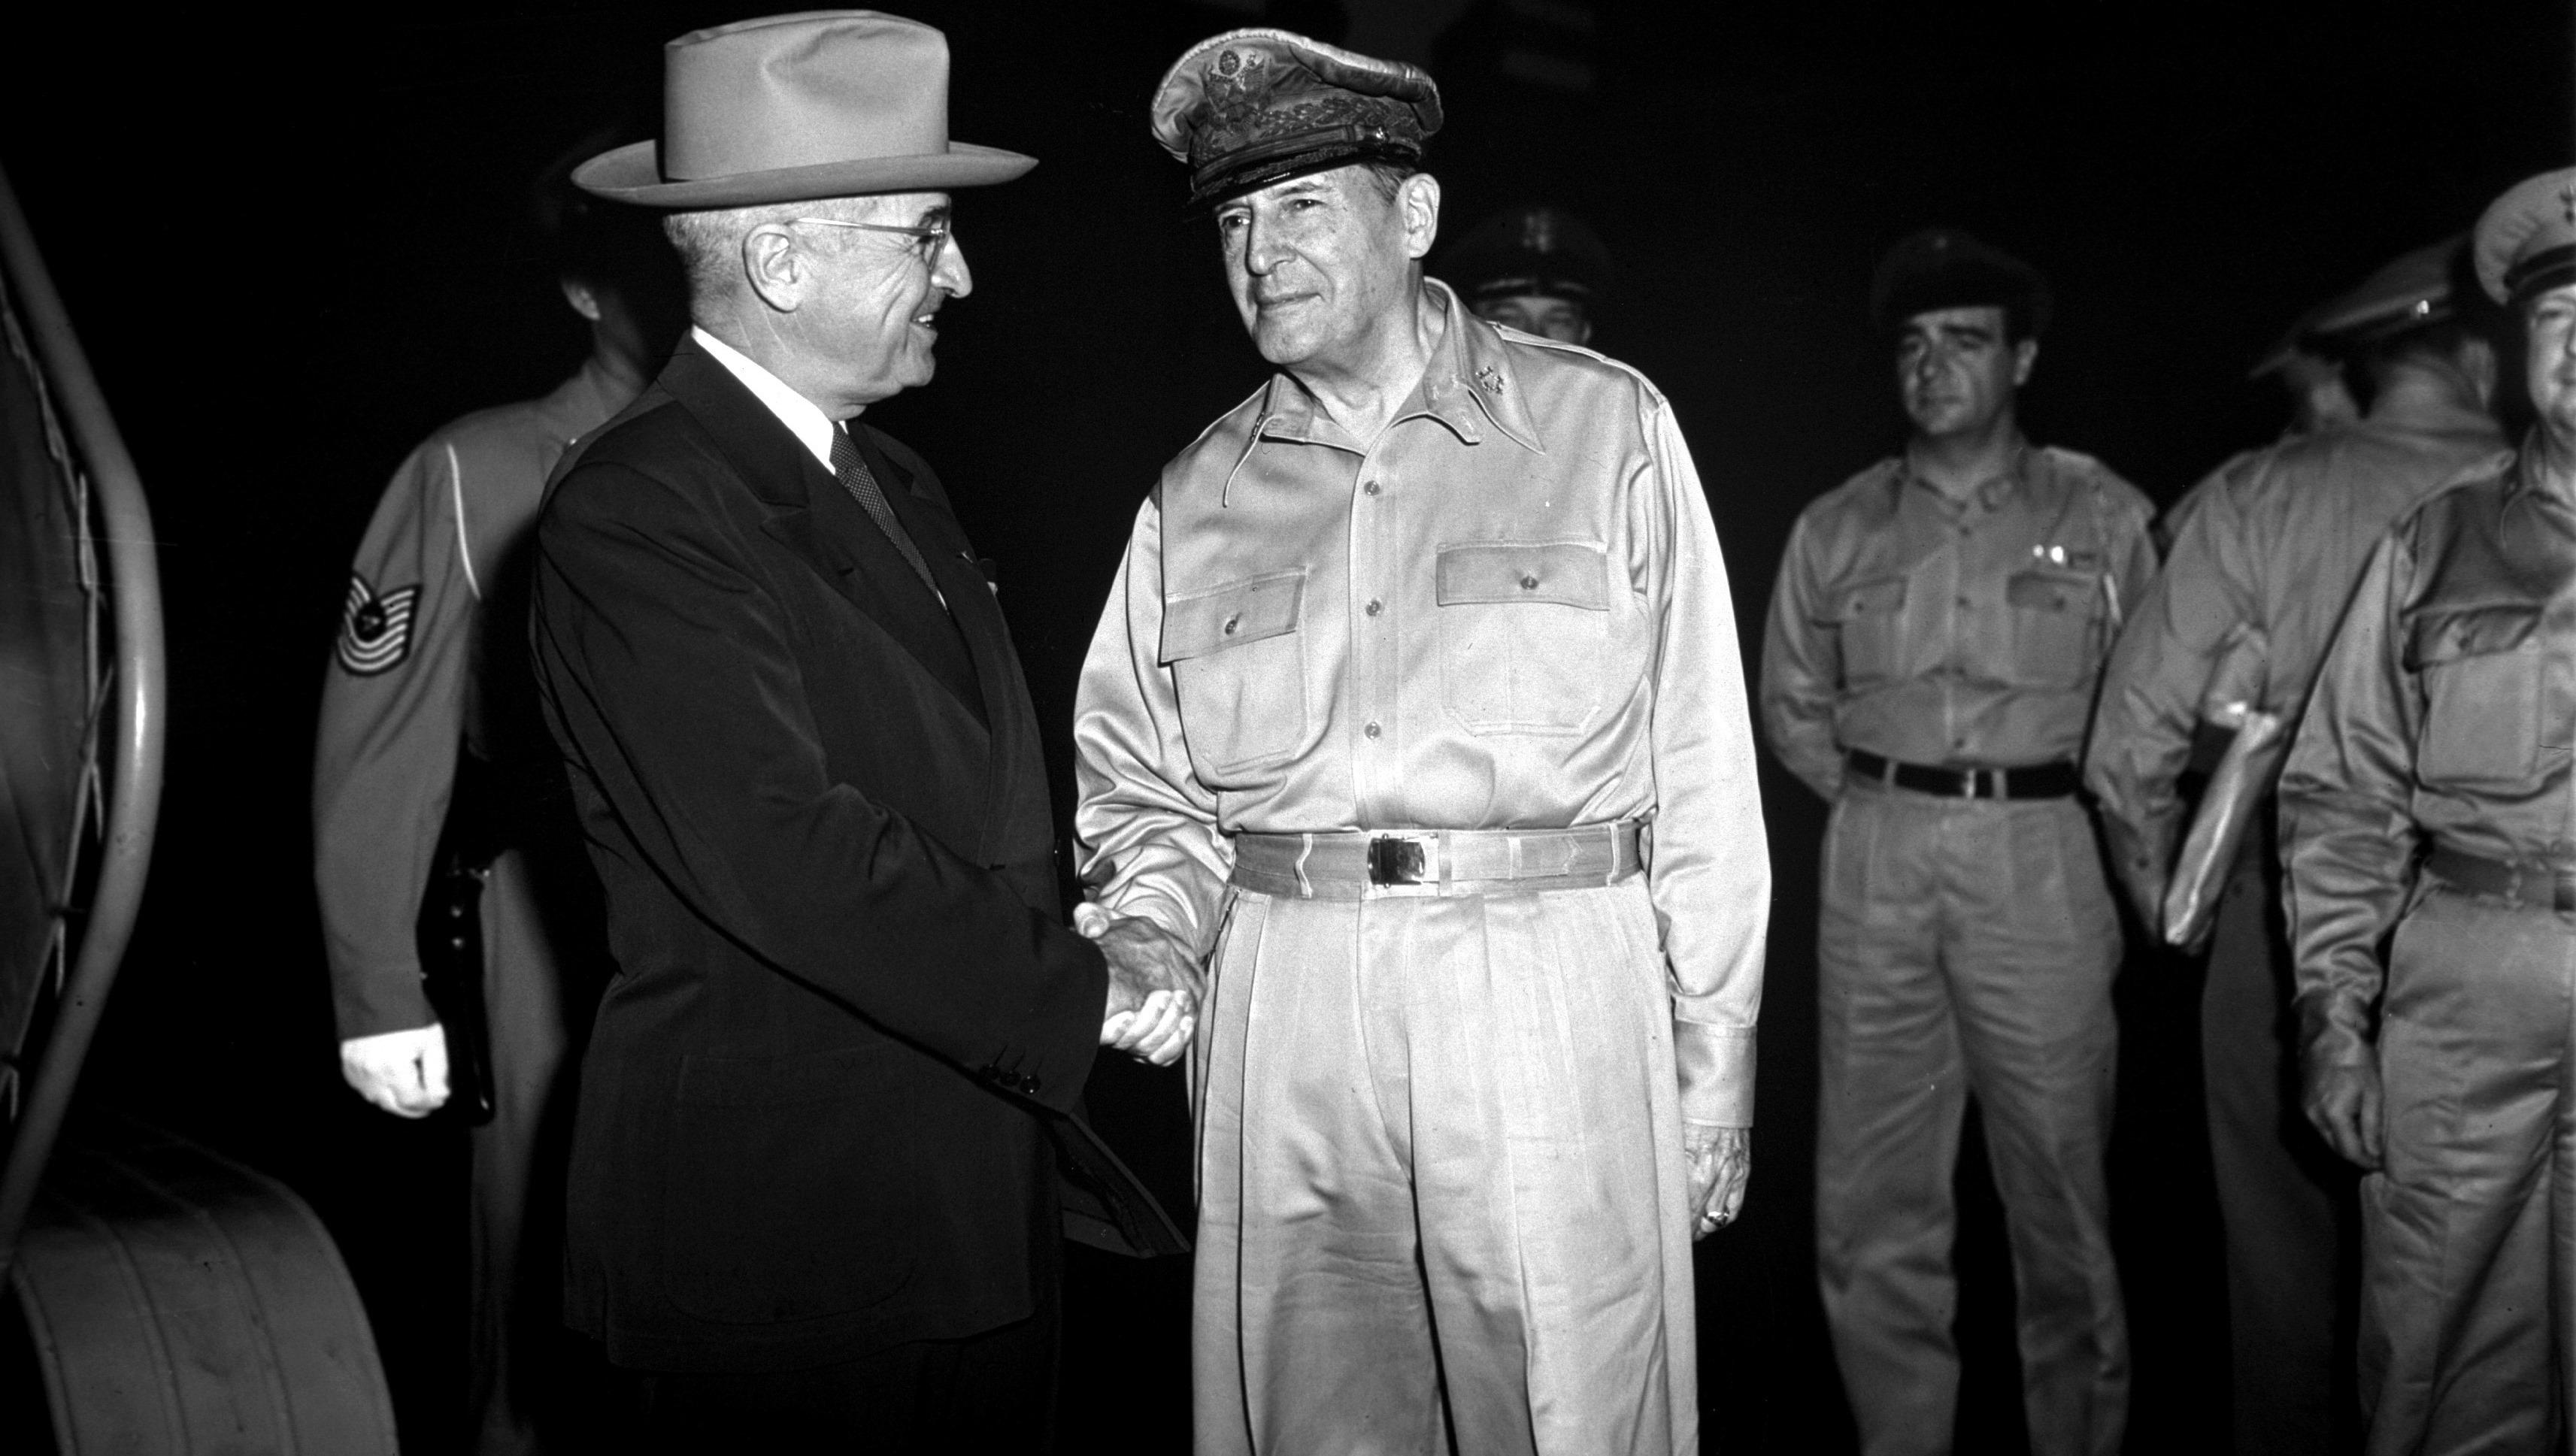 President Truman and General Douglas Macarthur at Wake Island, 1950. (Wikimedia Commons)